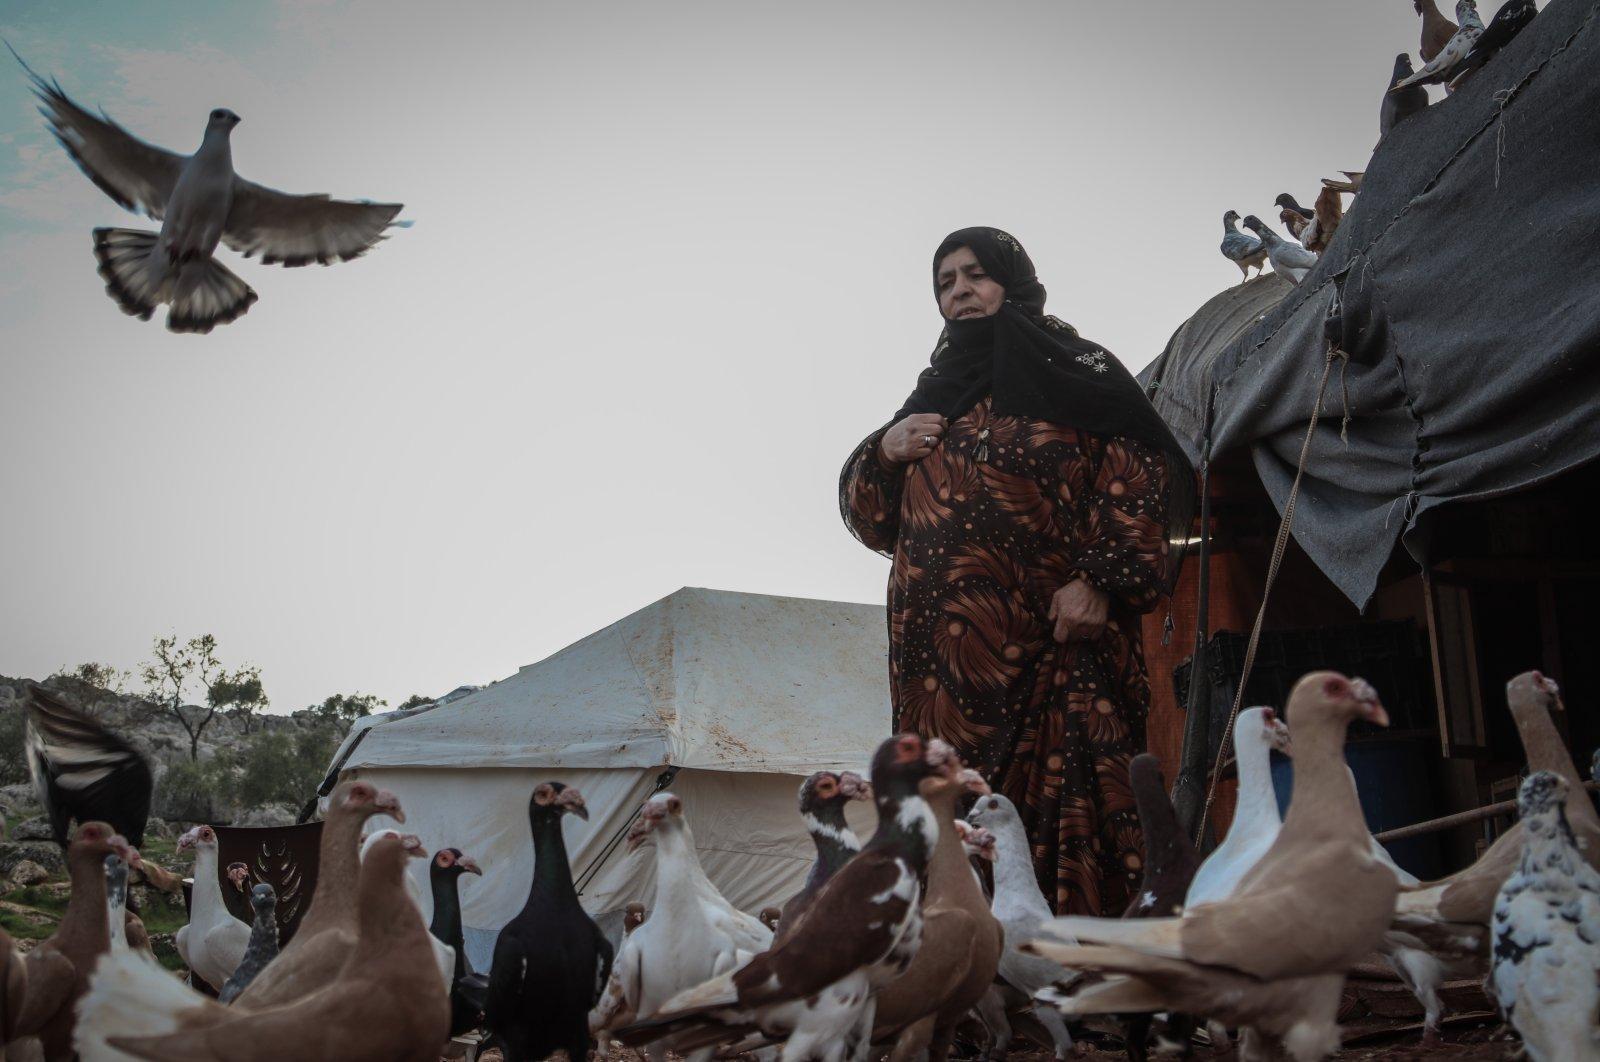 Heyam al-Nehar with her pigeons, Idlib, Syria, March 11, 2021. (AA)